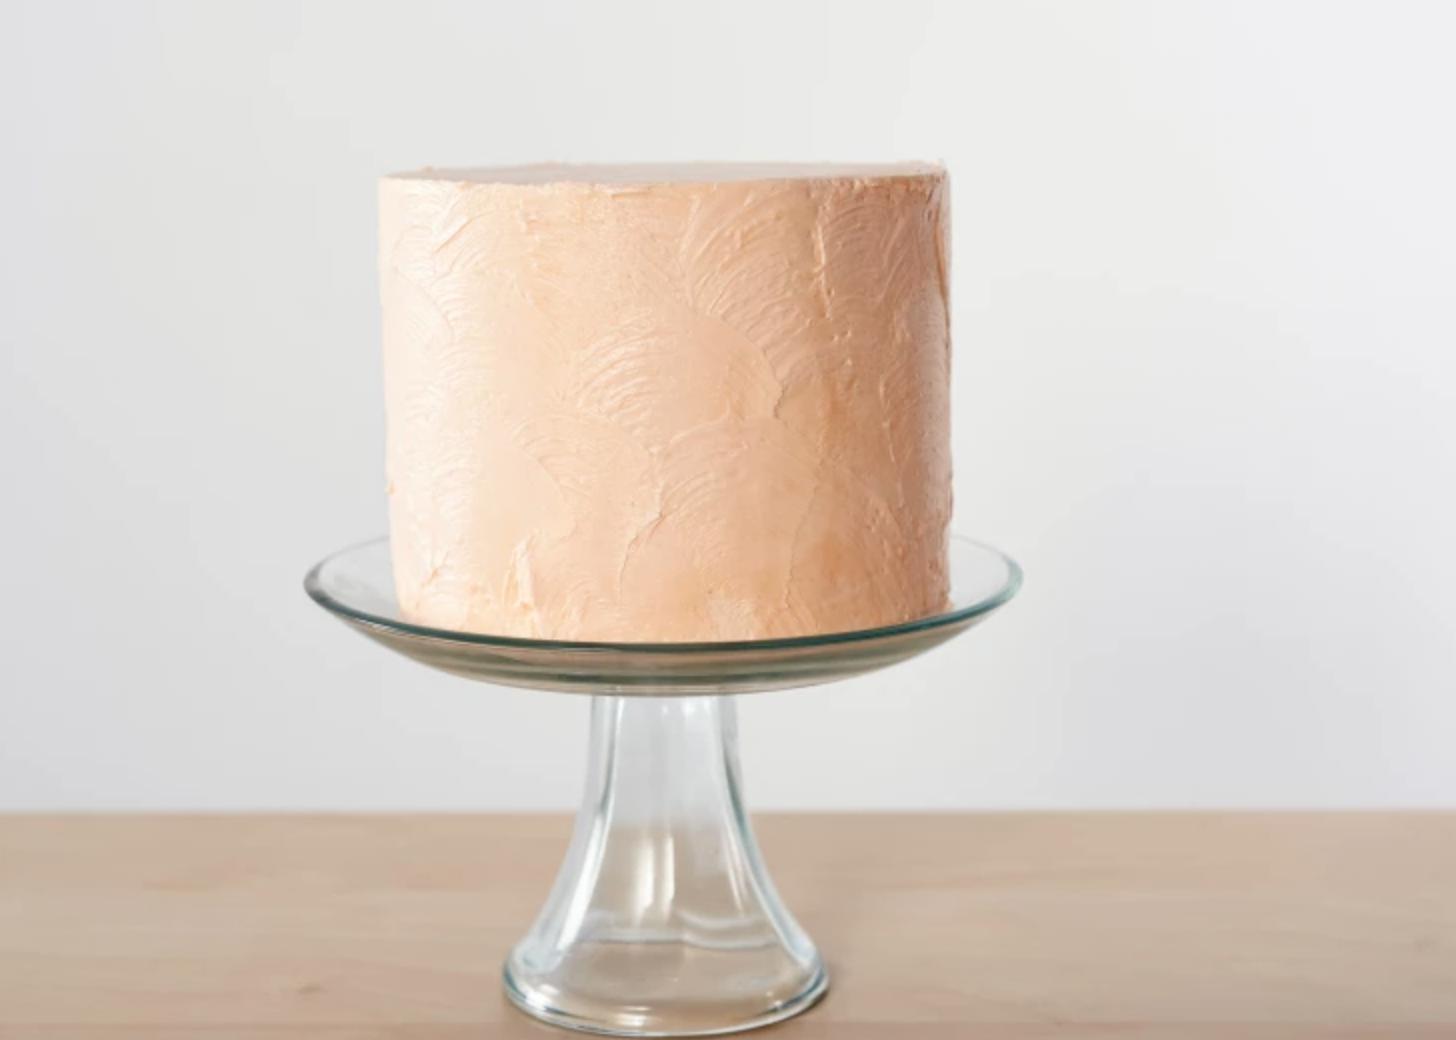 painted beige cake